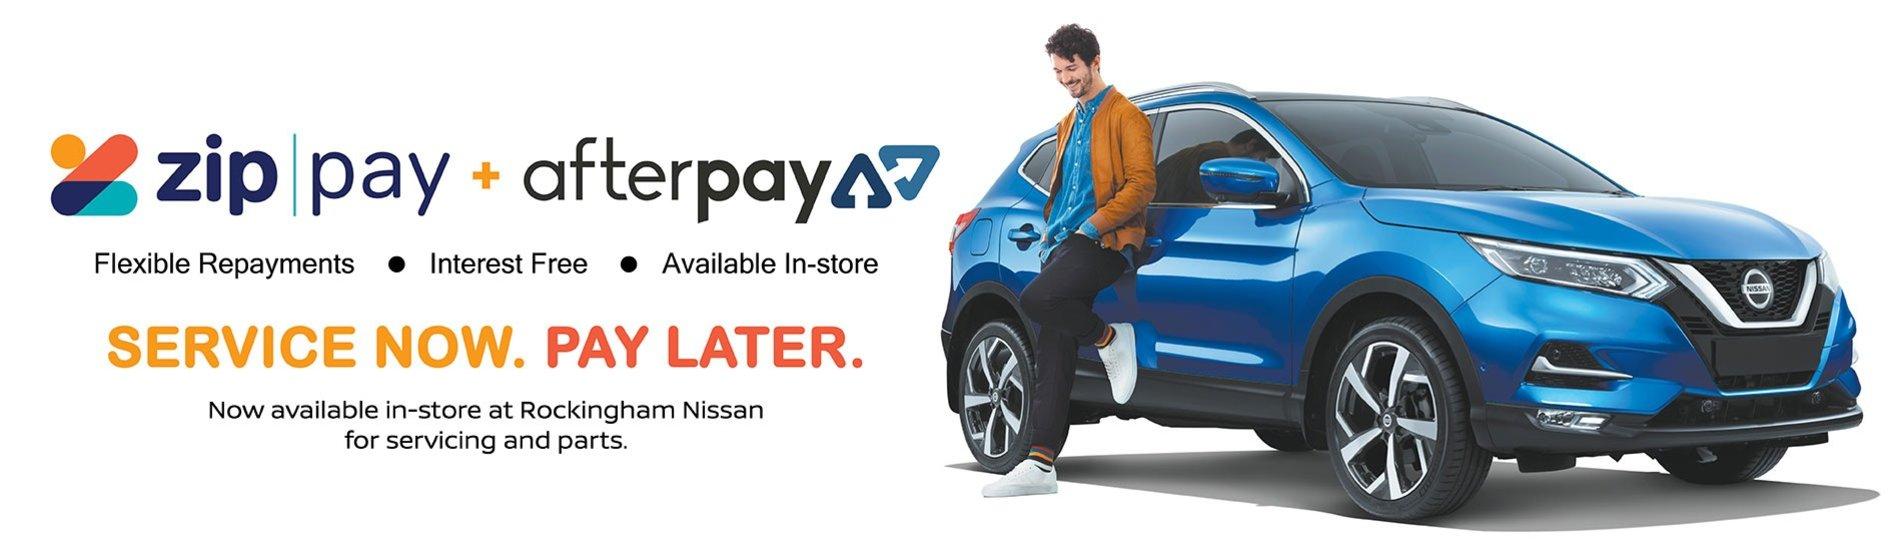 Rockingham Nissan - Zip Pay